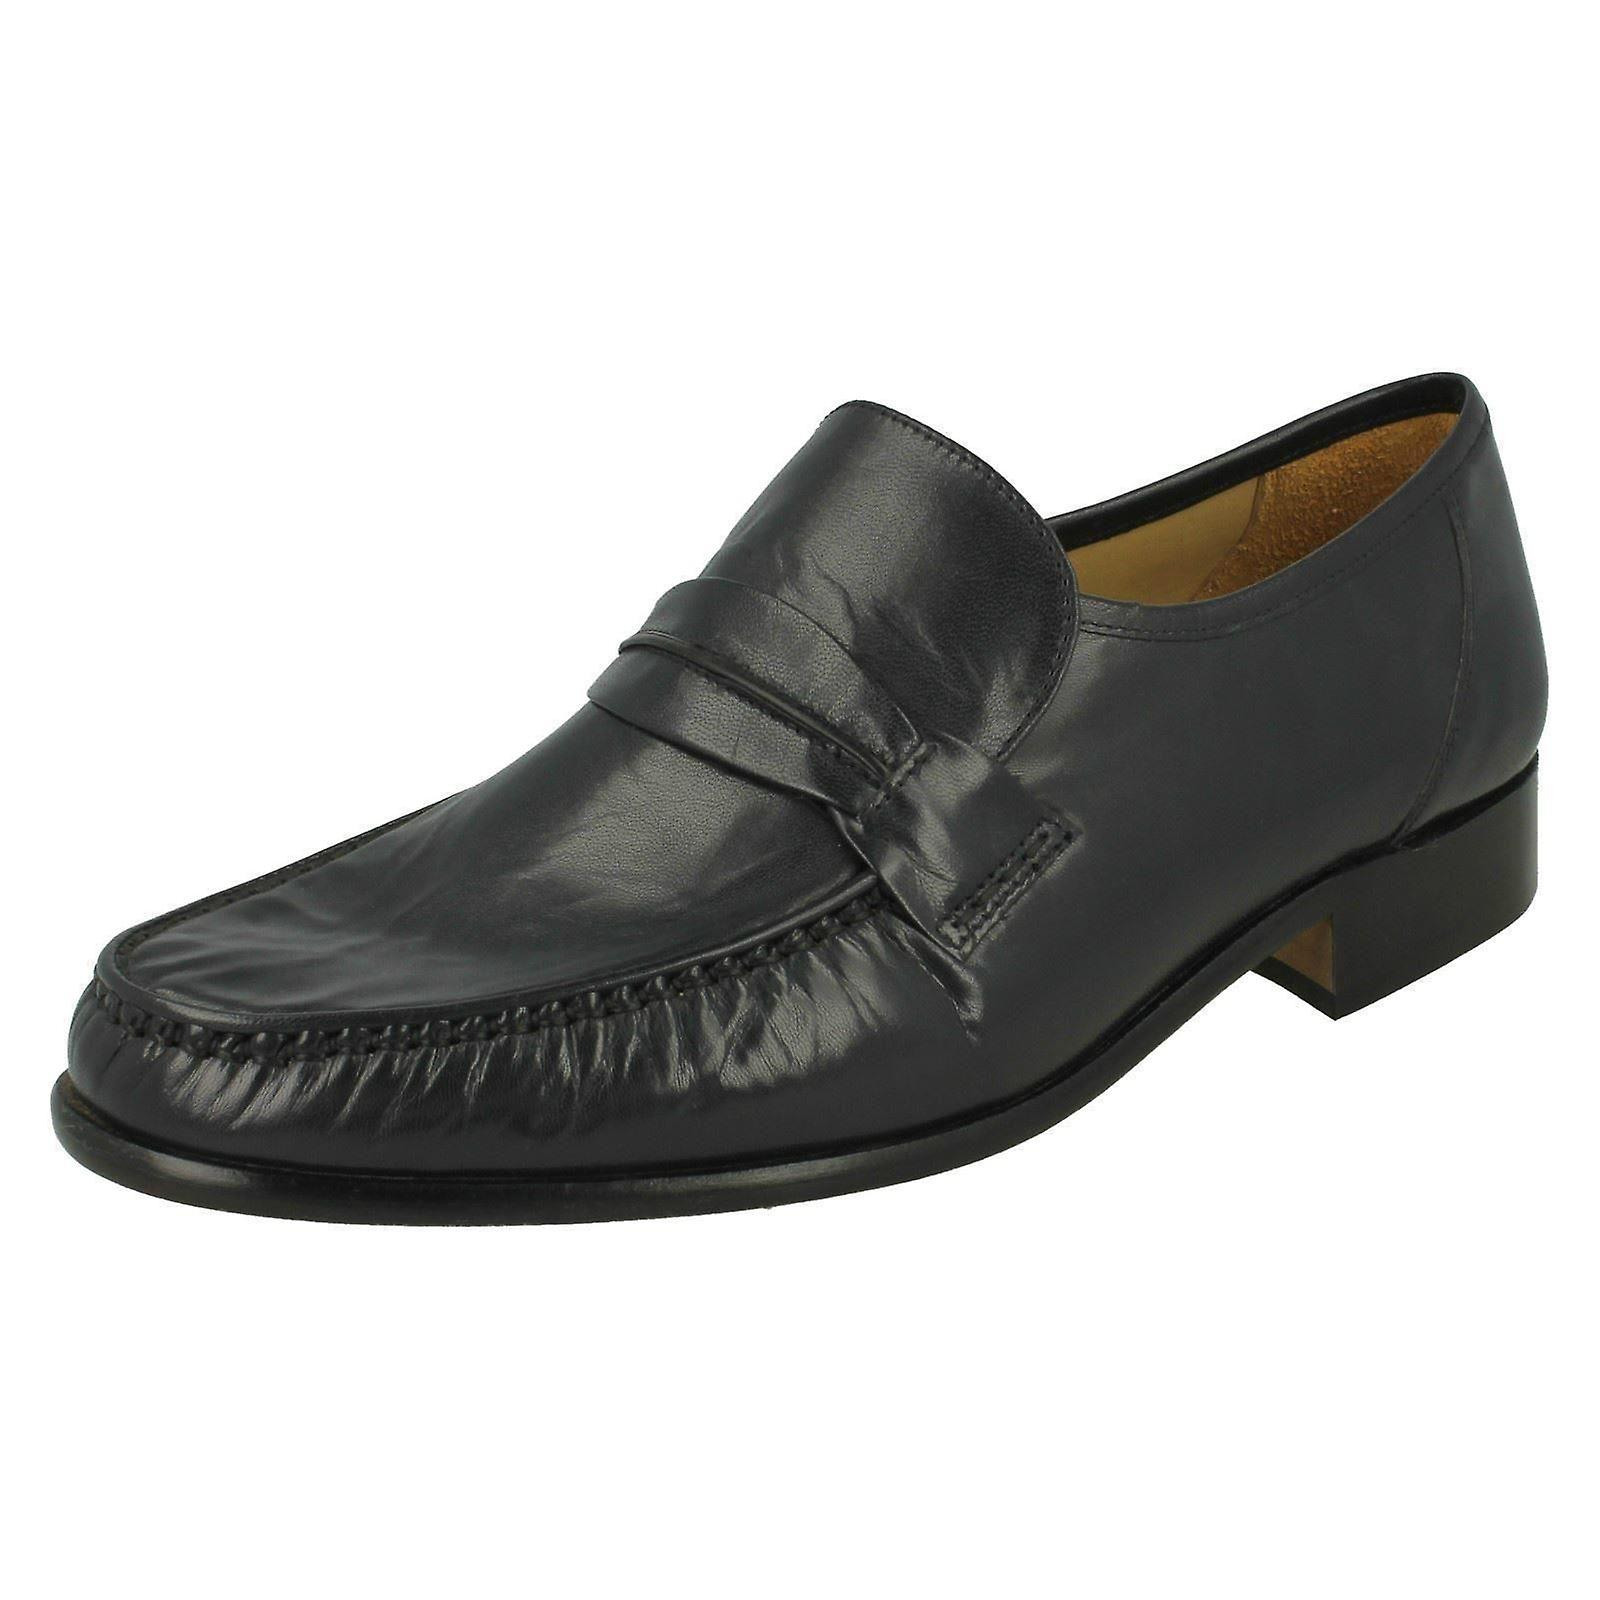 Mens Thomas stumpf formale Slip-on Schuhe Boston